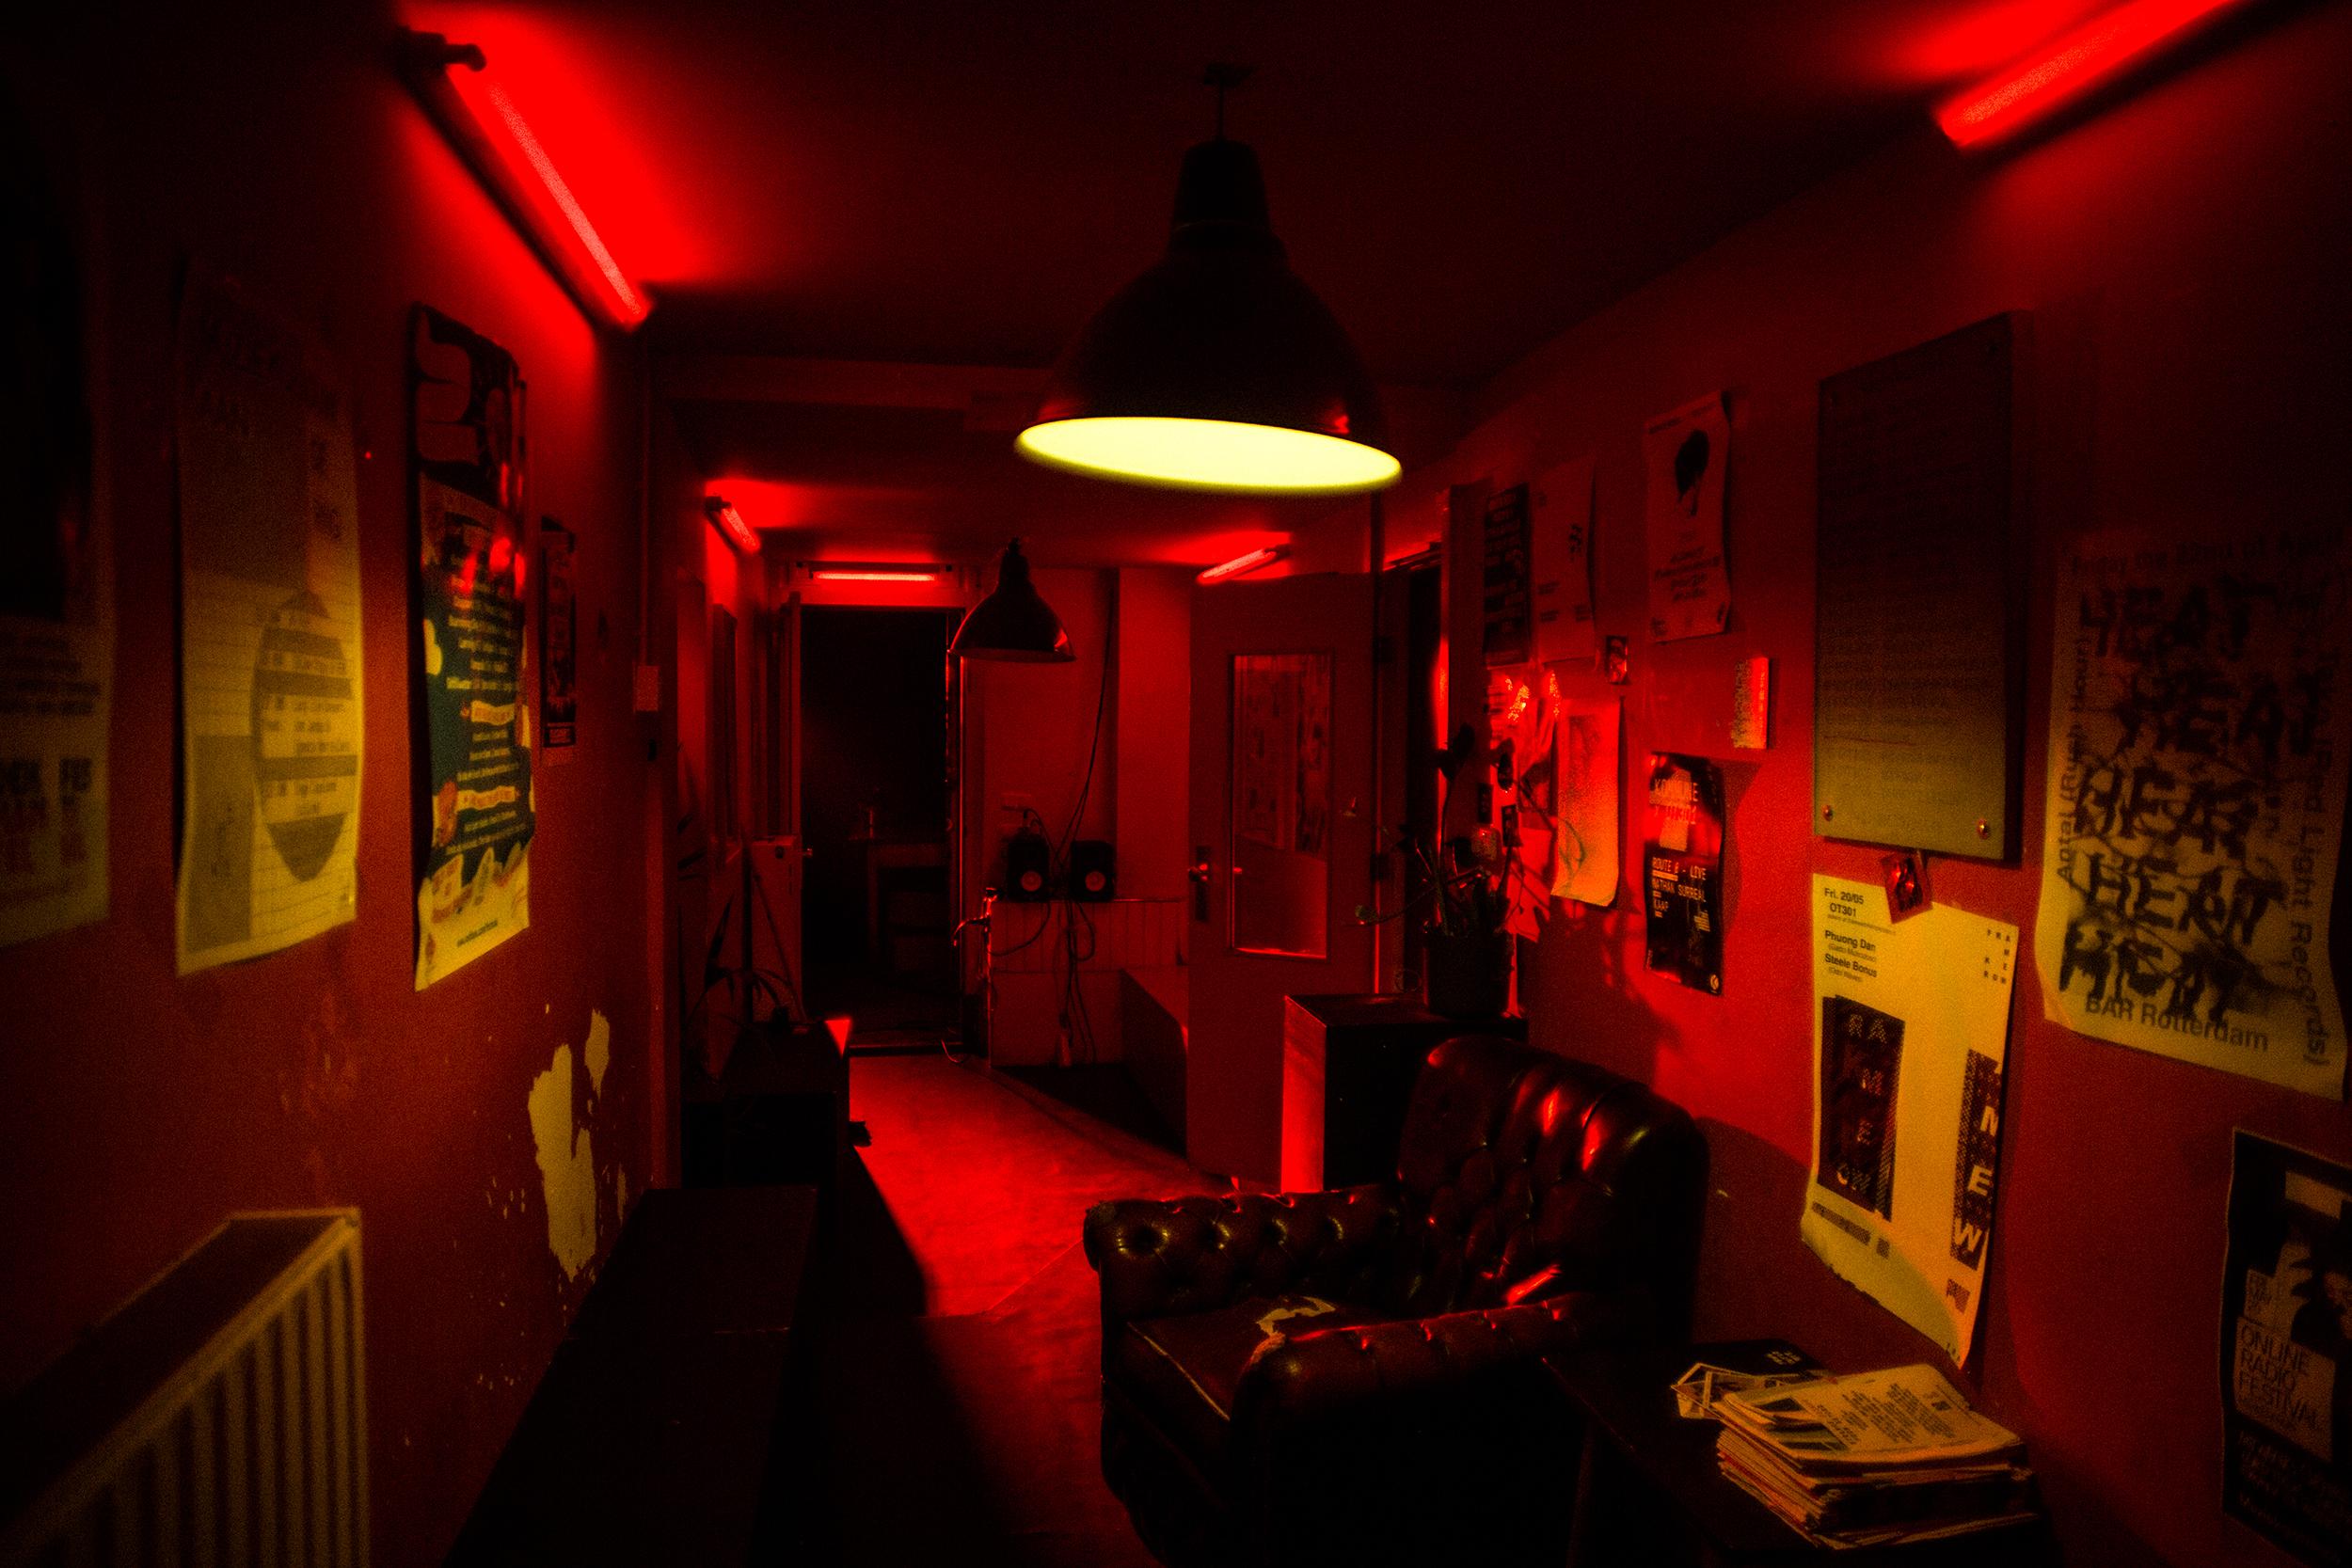 Dekmantel-Grolsch-Sole-Selectors-Red-Light-Radio-1.jpg